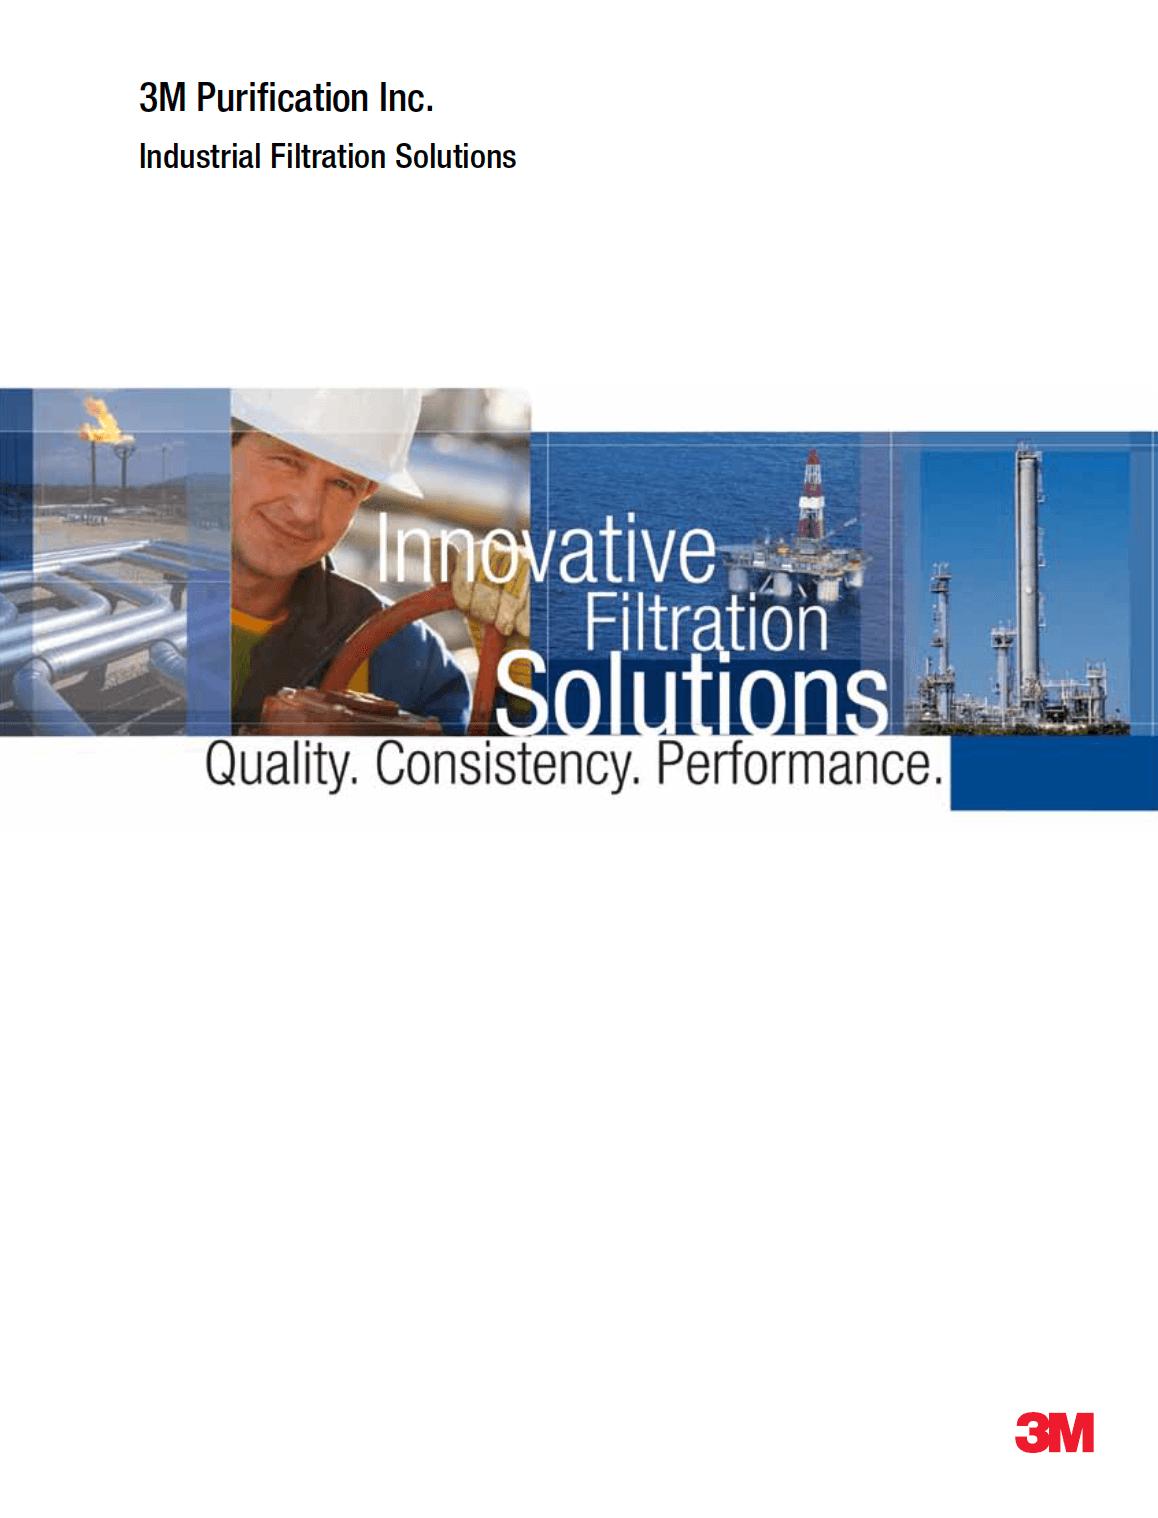 3M Purification Solution Brochure